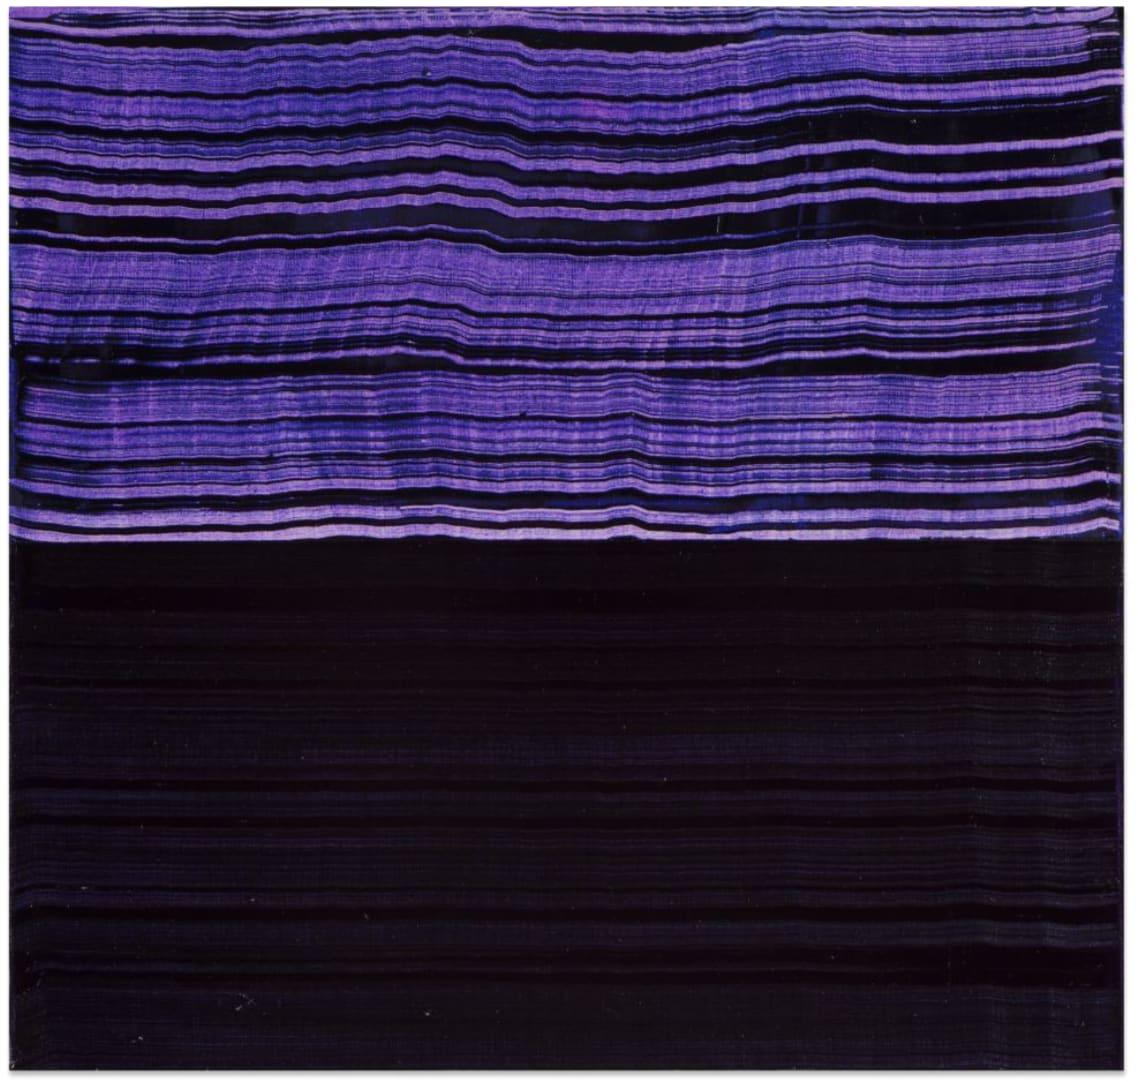 Ricardo Mazal, Violet Blue and Black 1, 2016